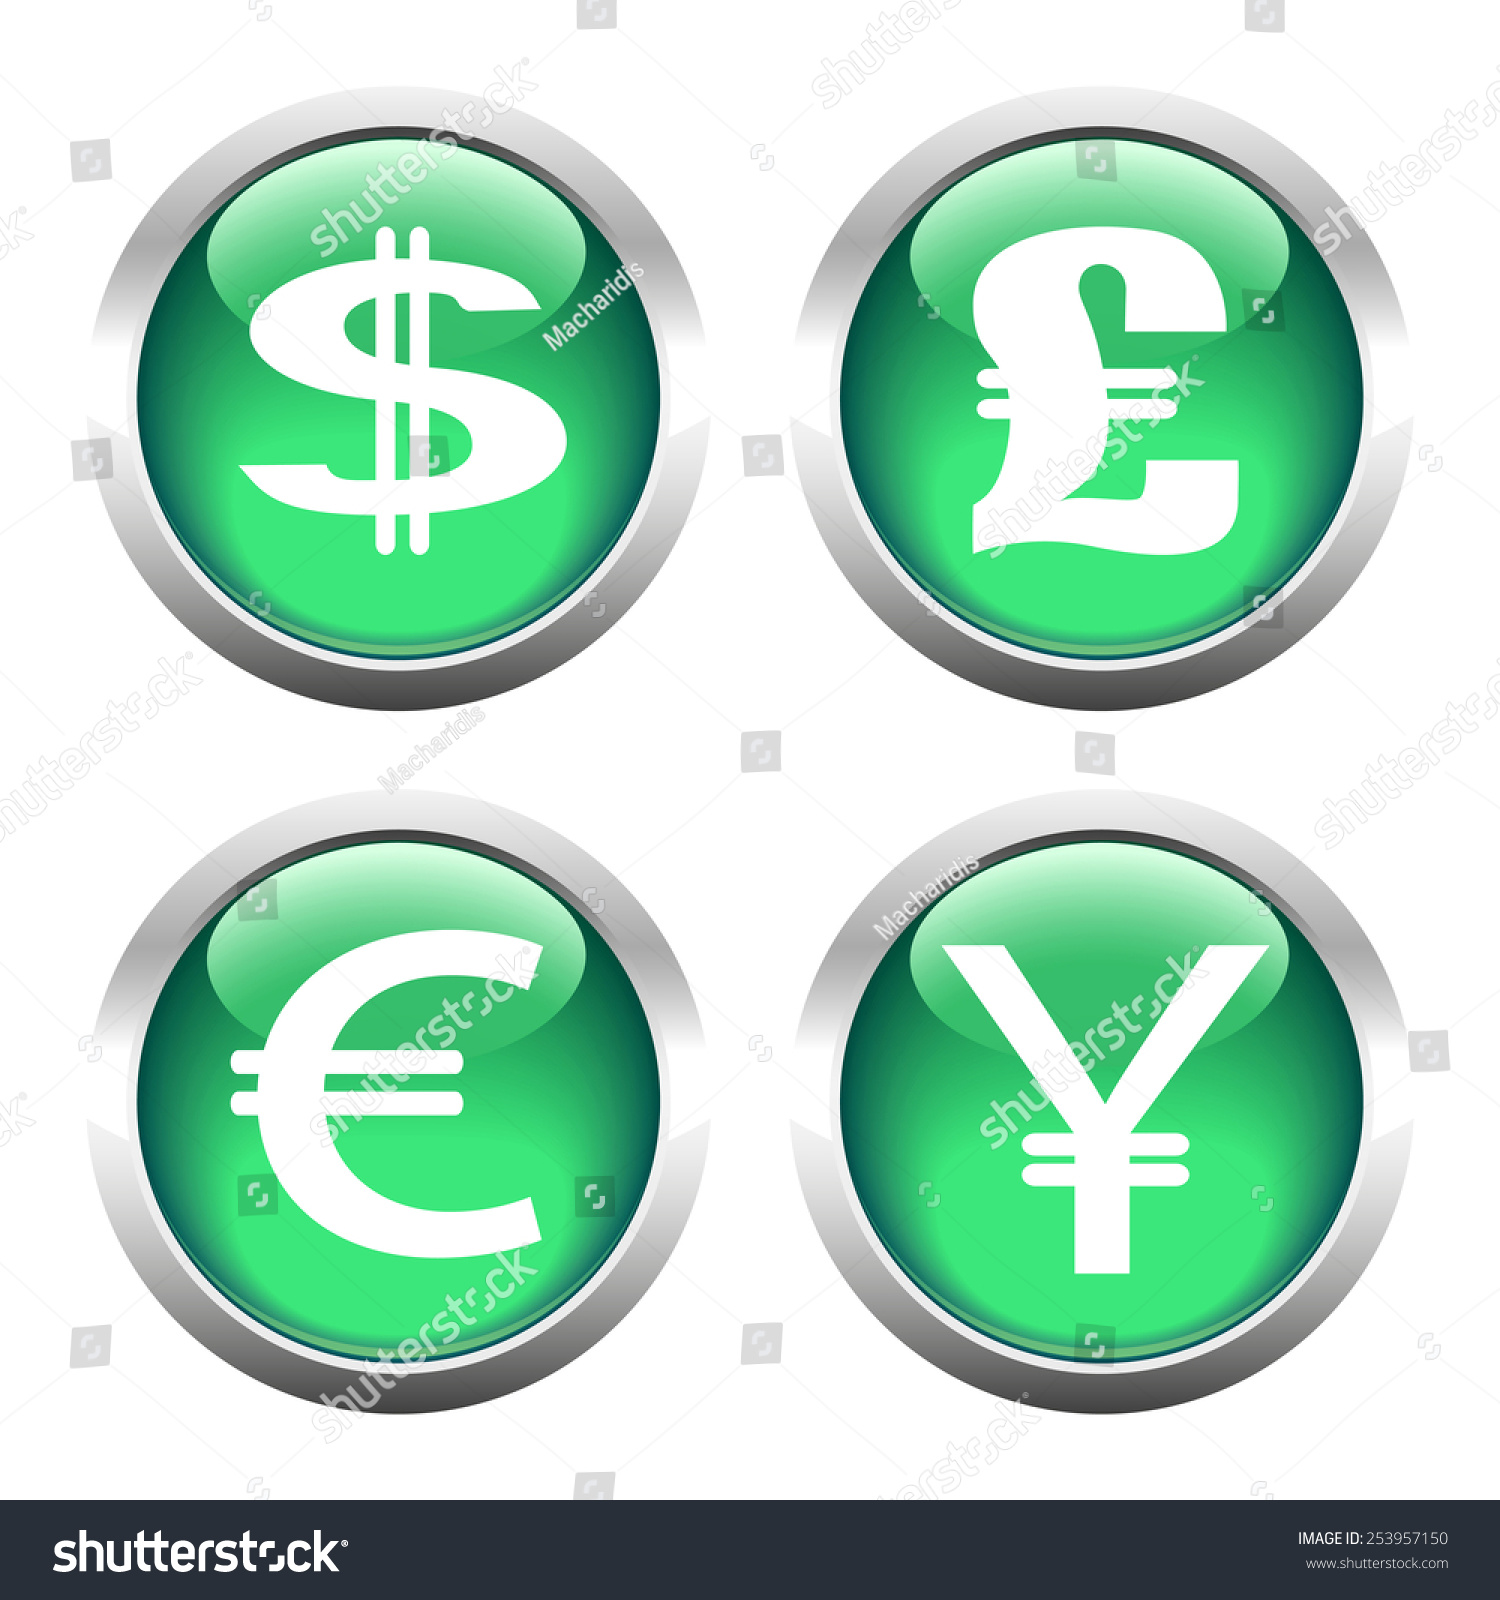 Set buttons web currency symbols dollar stock vector 253957150 set of buttons for web currency symbols dollar euro pound yen buycottarizona Choice Image